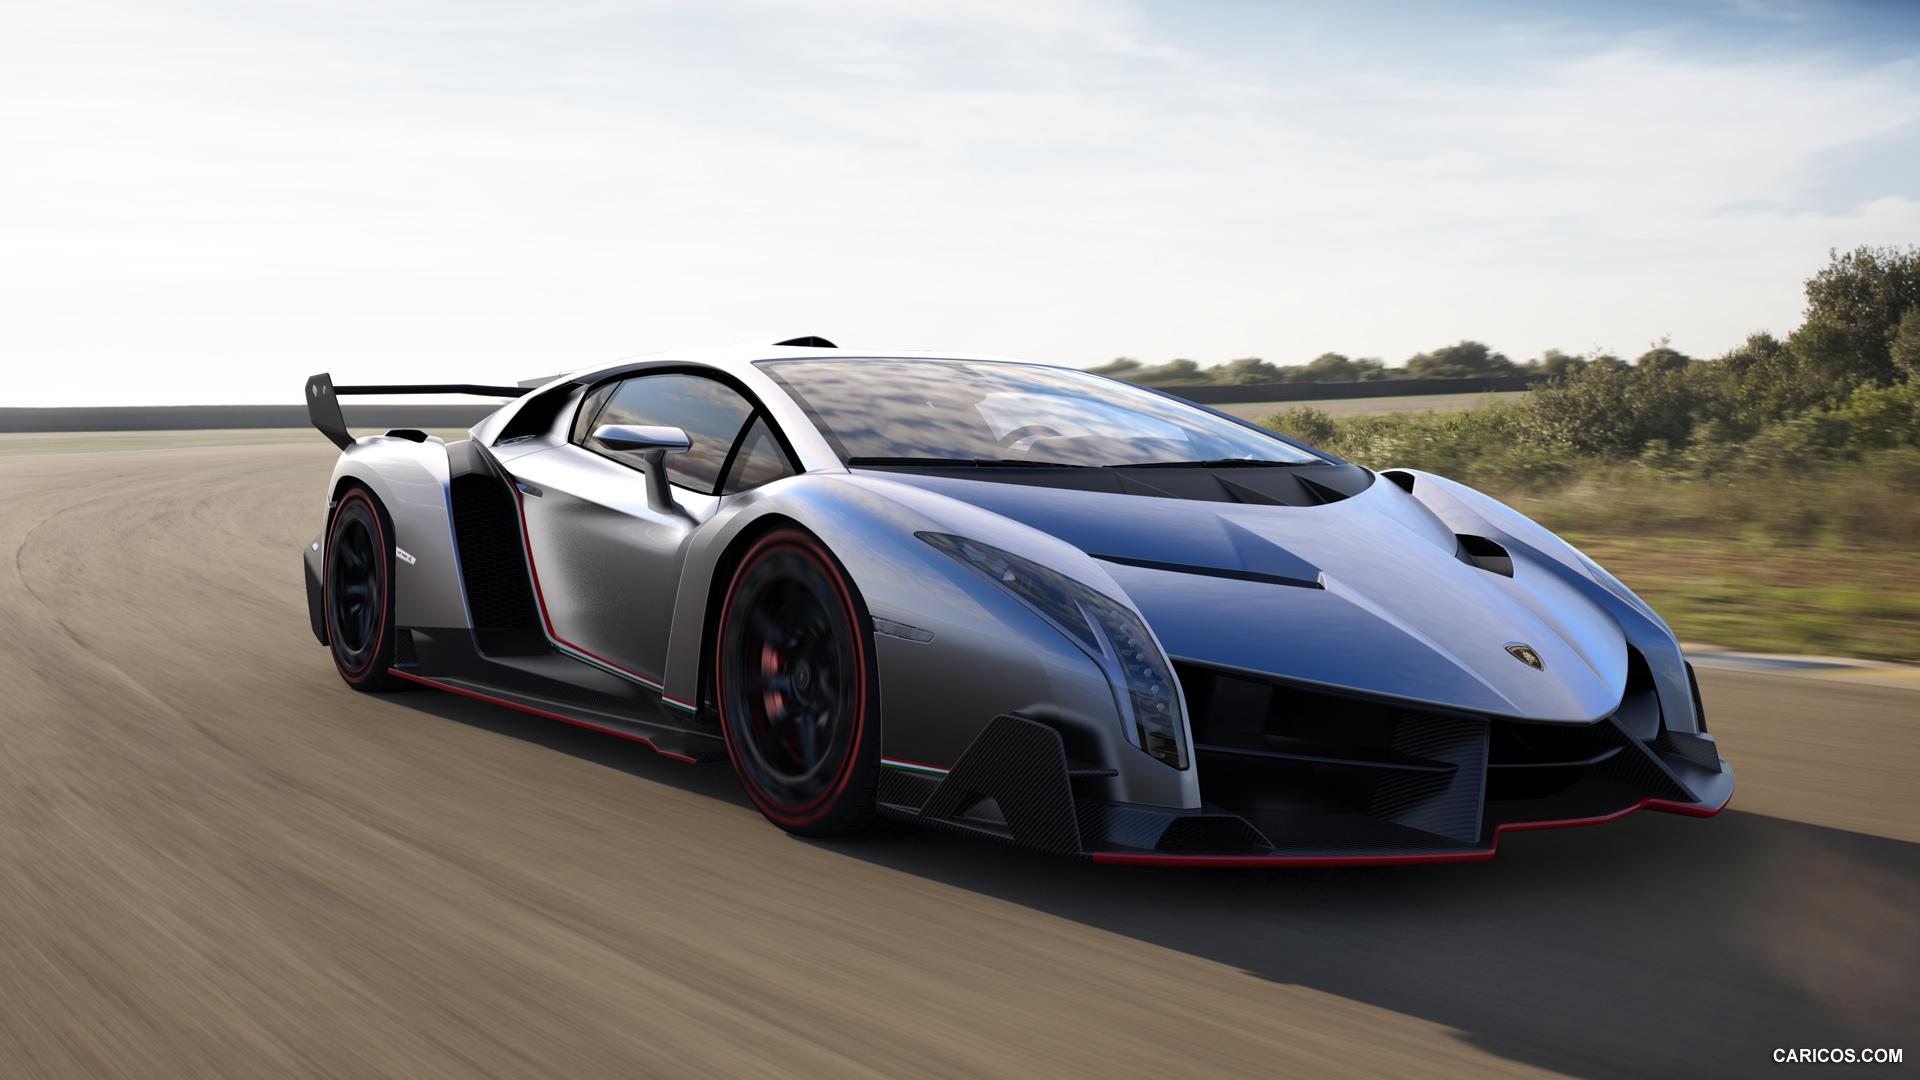 2013 Lamborghini Veneno - Front Wallpaper